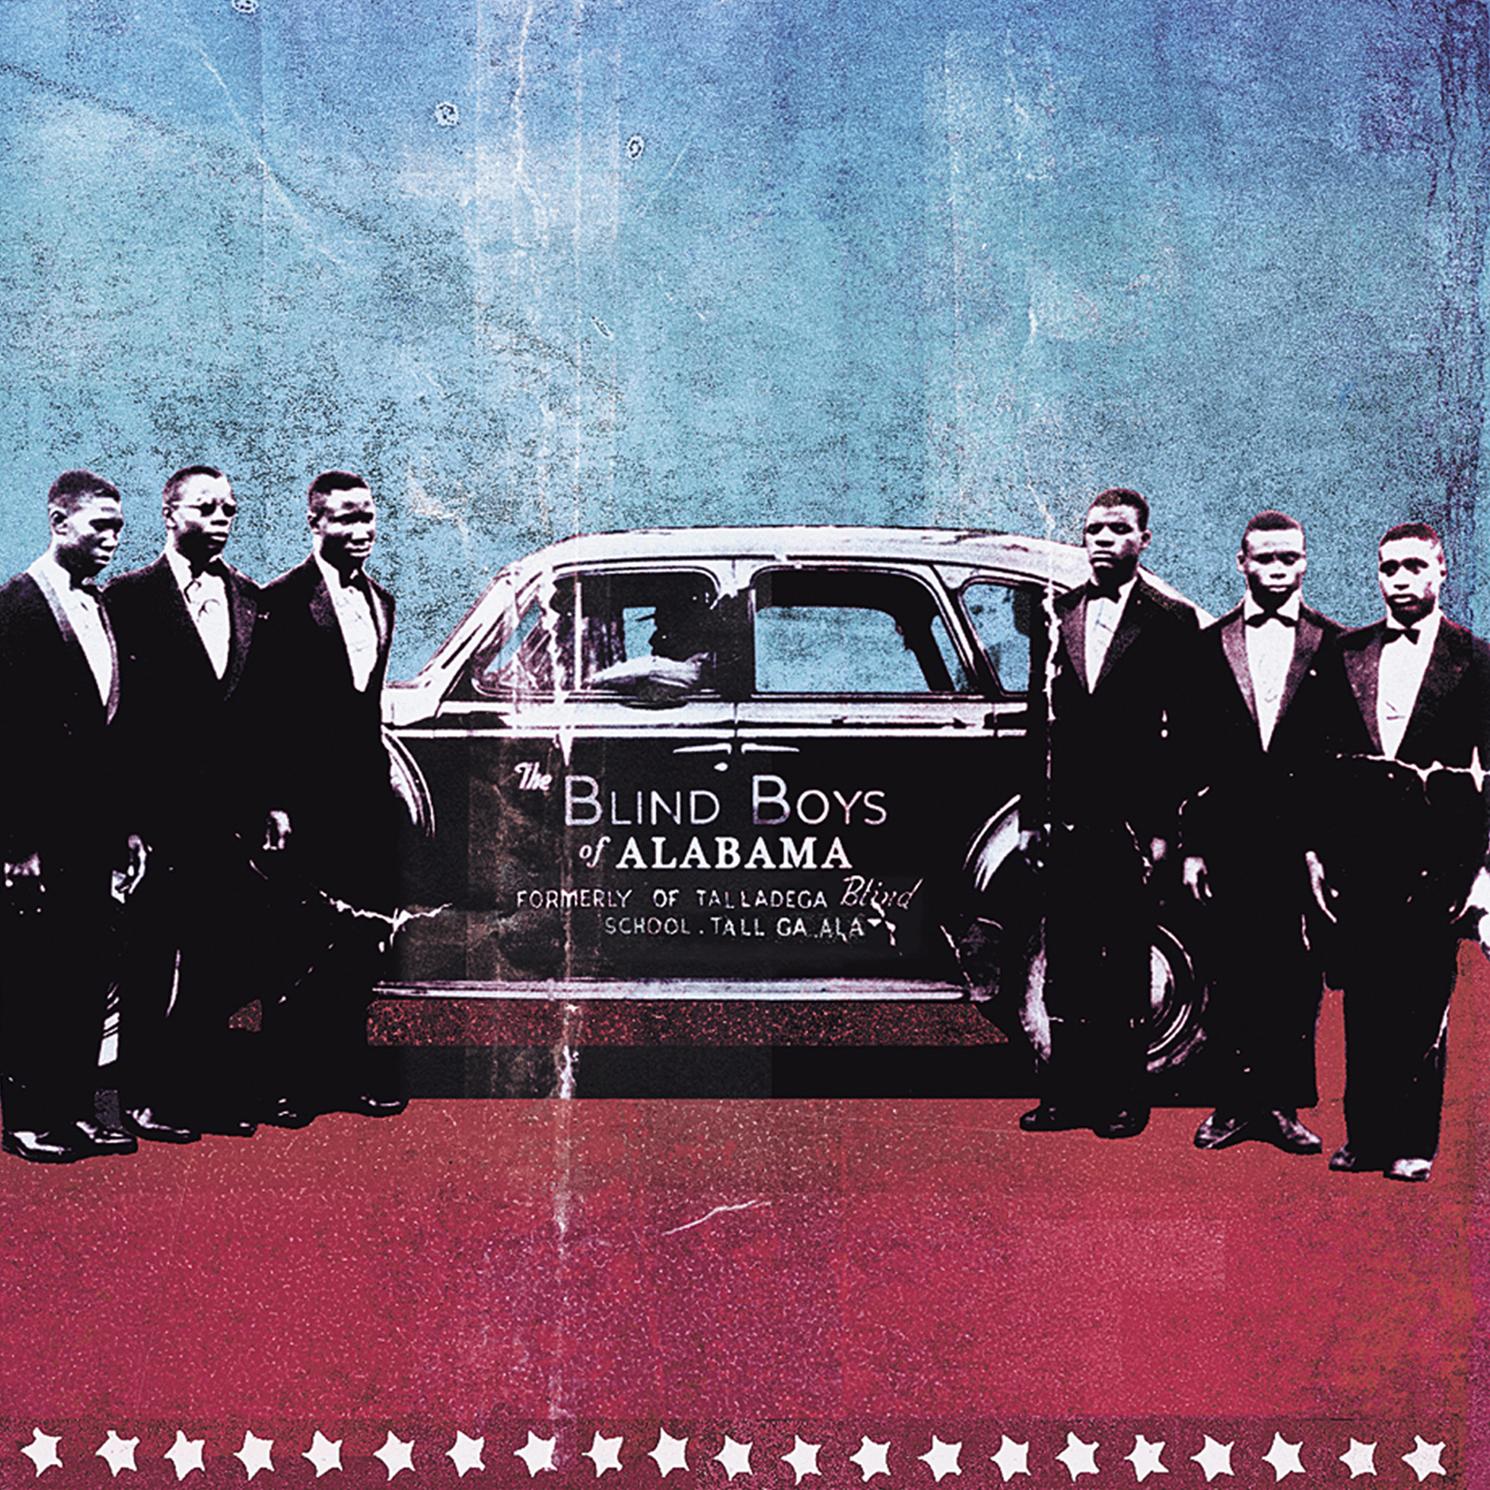 The Blind Boys of Alabama-Spirit of the Century  Release Date: May 13, 2016 Label: Omnivore Recordings  SERVICE: Restoration, Mastering (Bonus tracks) NUMBER OF DISCS: 1 GENRE: Gospel FORMAT: CD